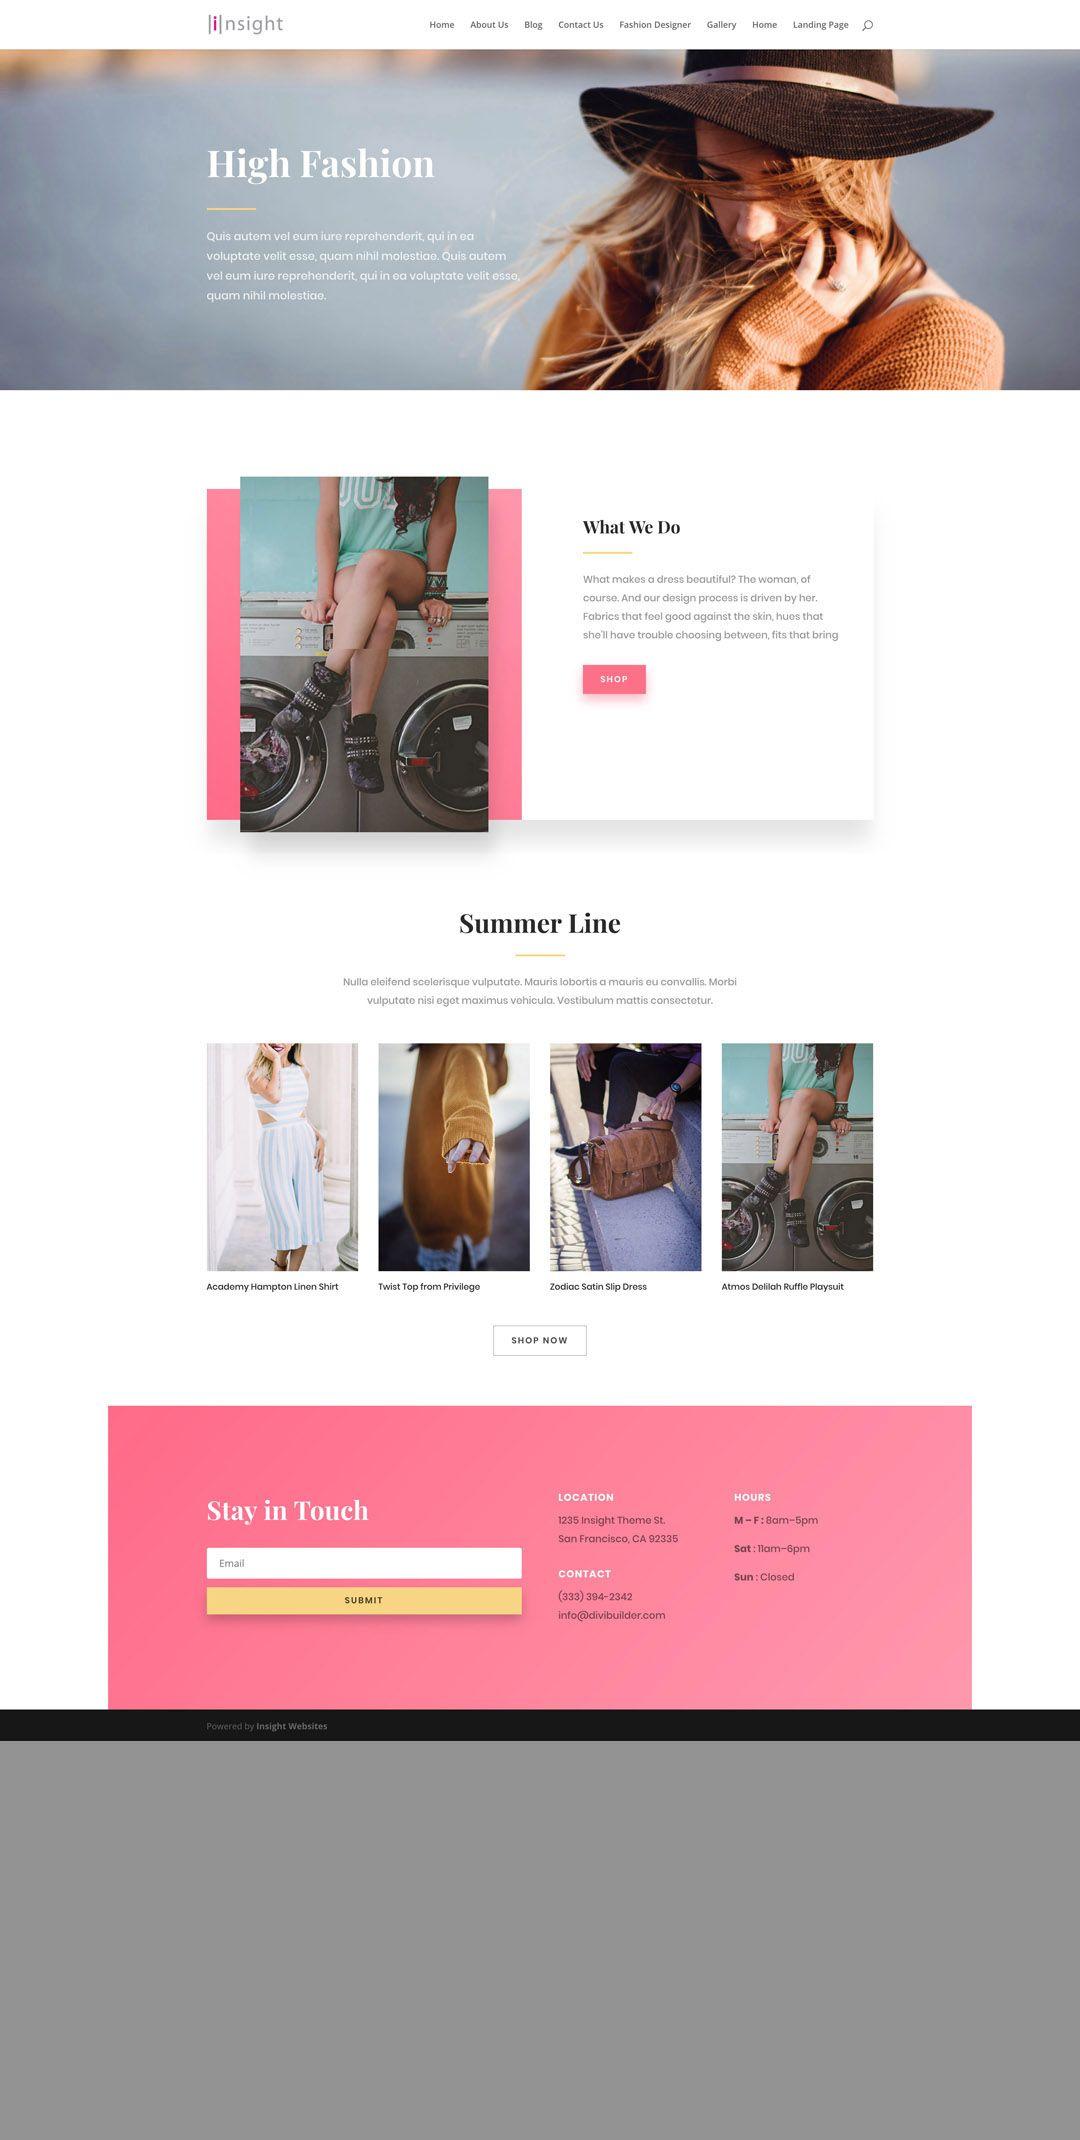 Fashion Designer S Website Design Layouts Website Layout Inspiration Website Design Layout Website Design